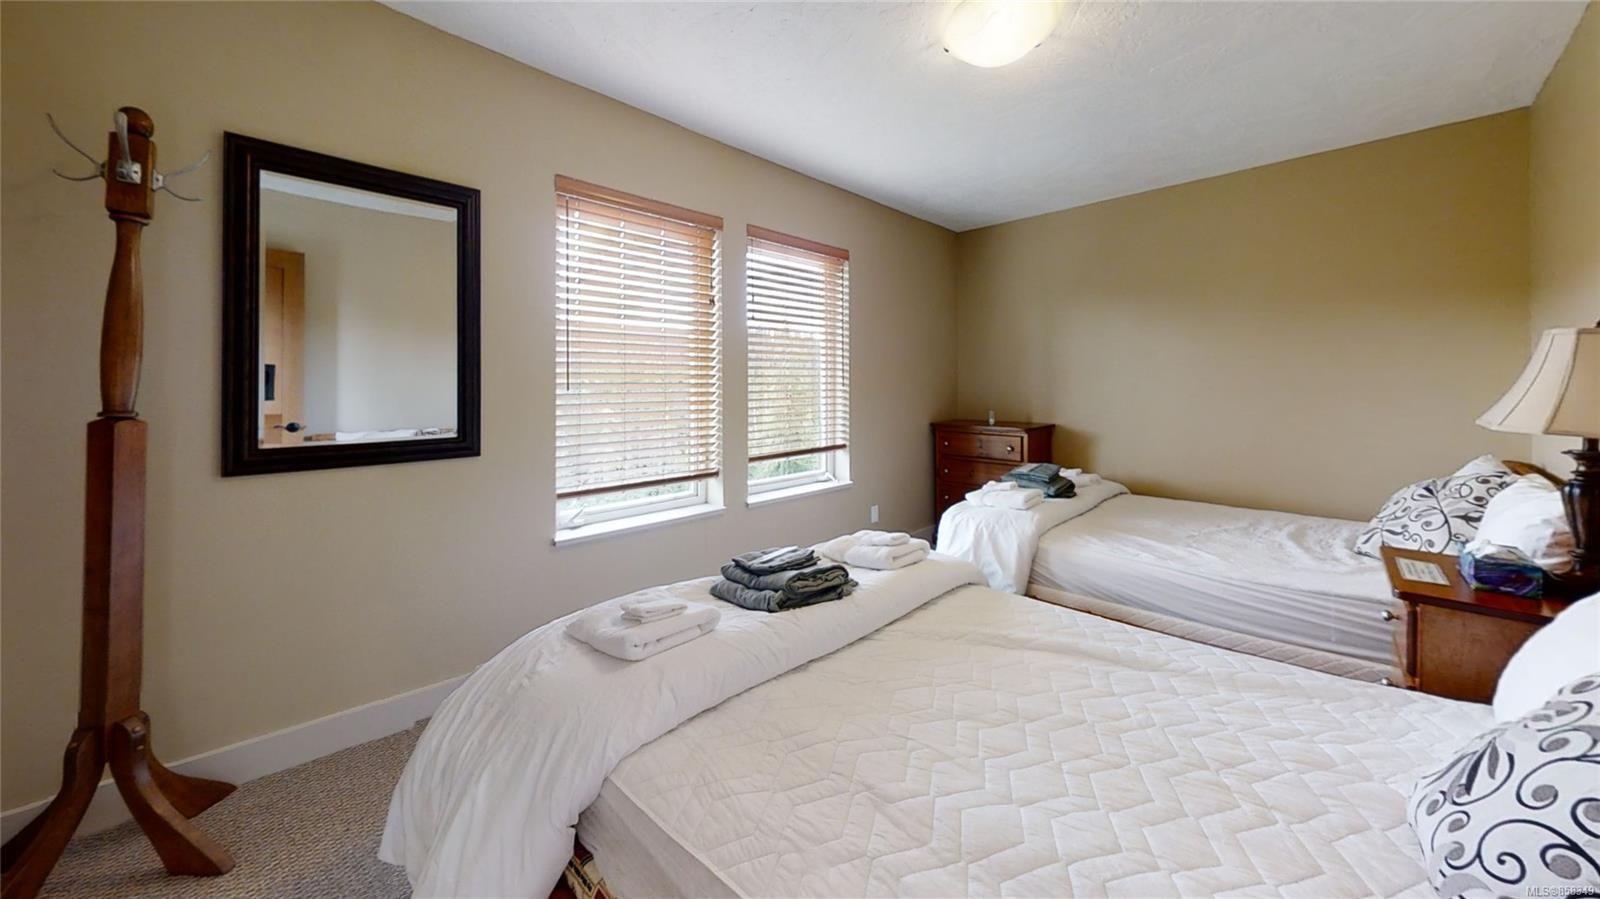 Main Photo: 899 Cruikshank Ridge in : CV Mt Washington House for sale (Comox Valley)  : MLS®# 858349